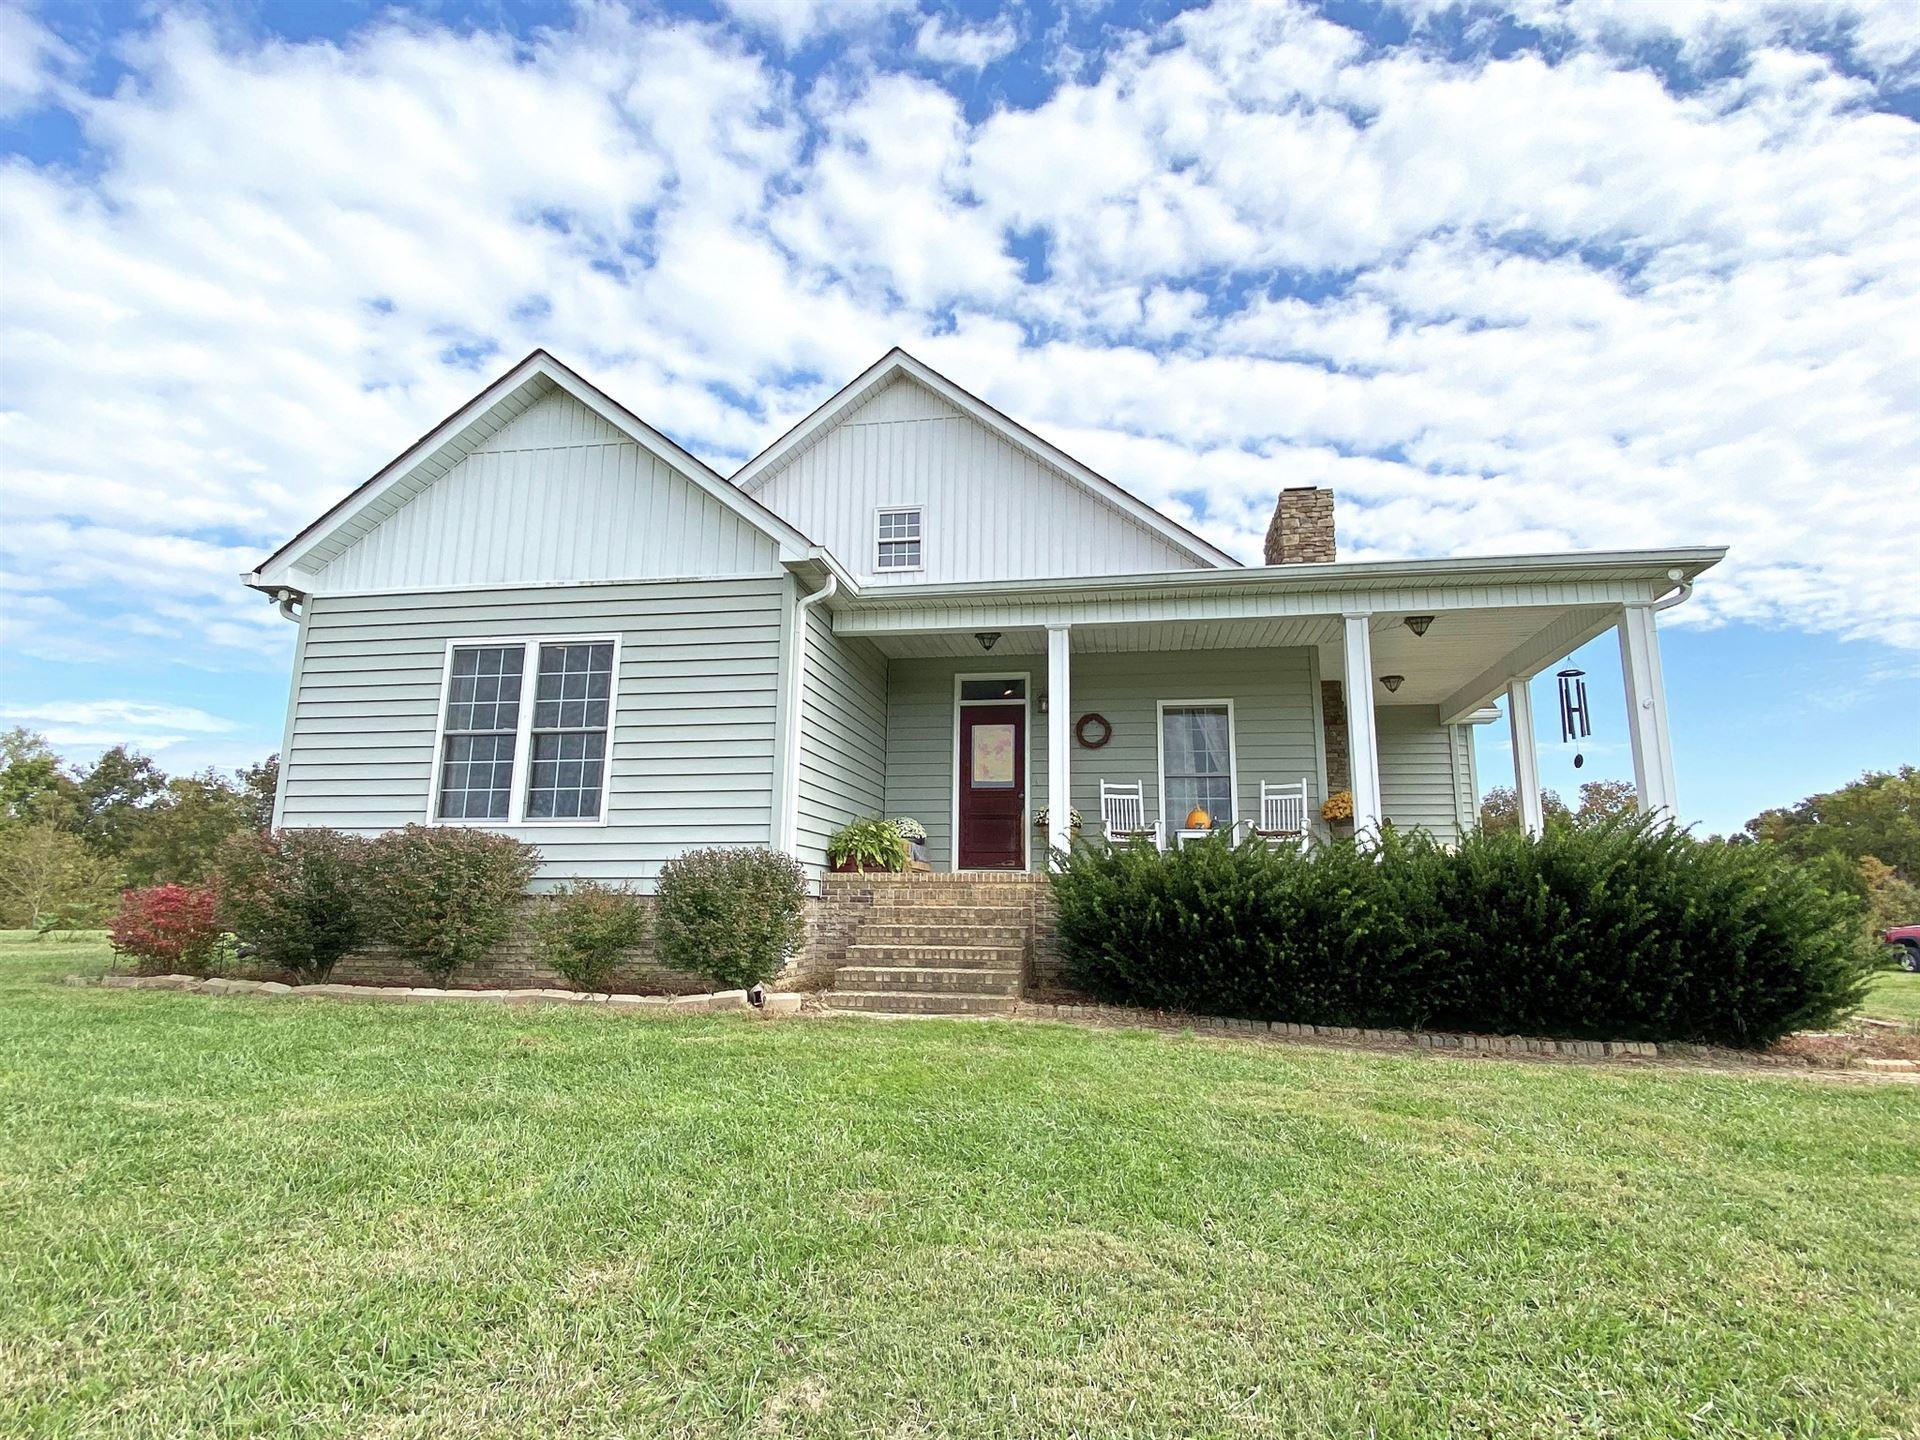 Photo of 585 Blooming Grove Rd, Pulaski, TN 38478 (MLS # 2199938)